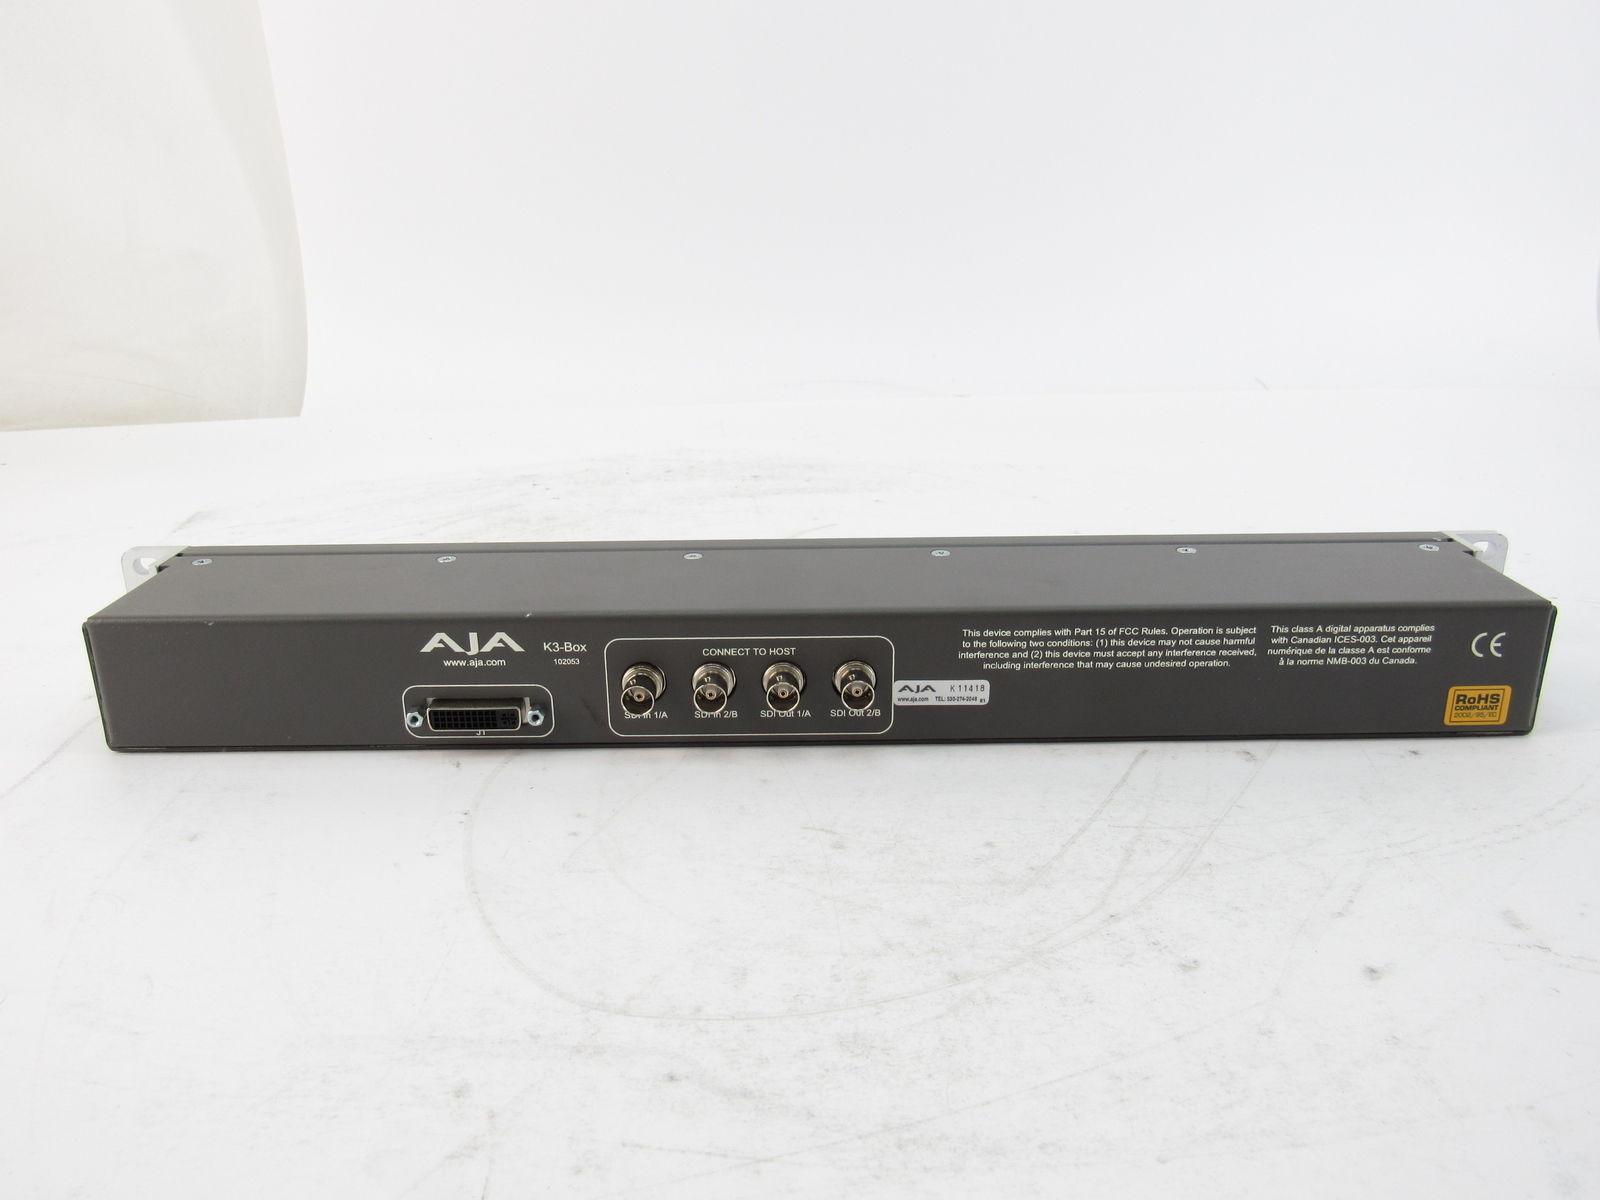 AJA Kona 3G + AJA Breakout K3-Box + cablage - TBE